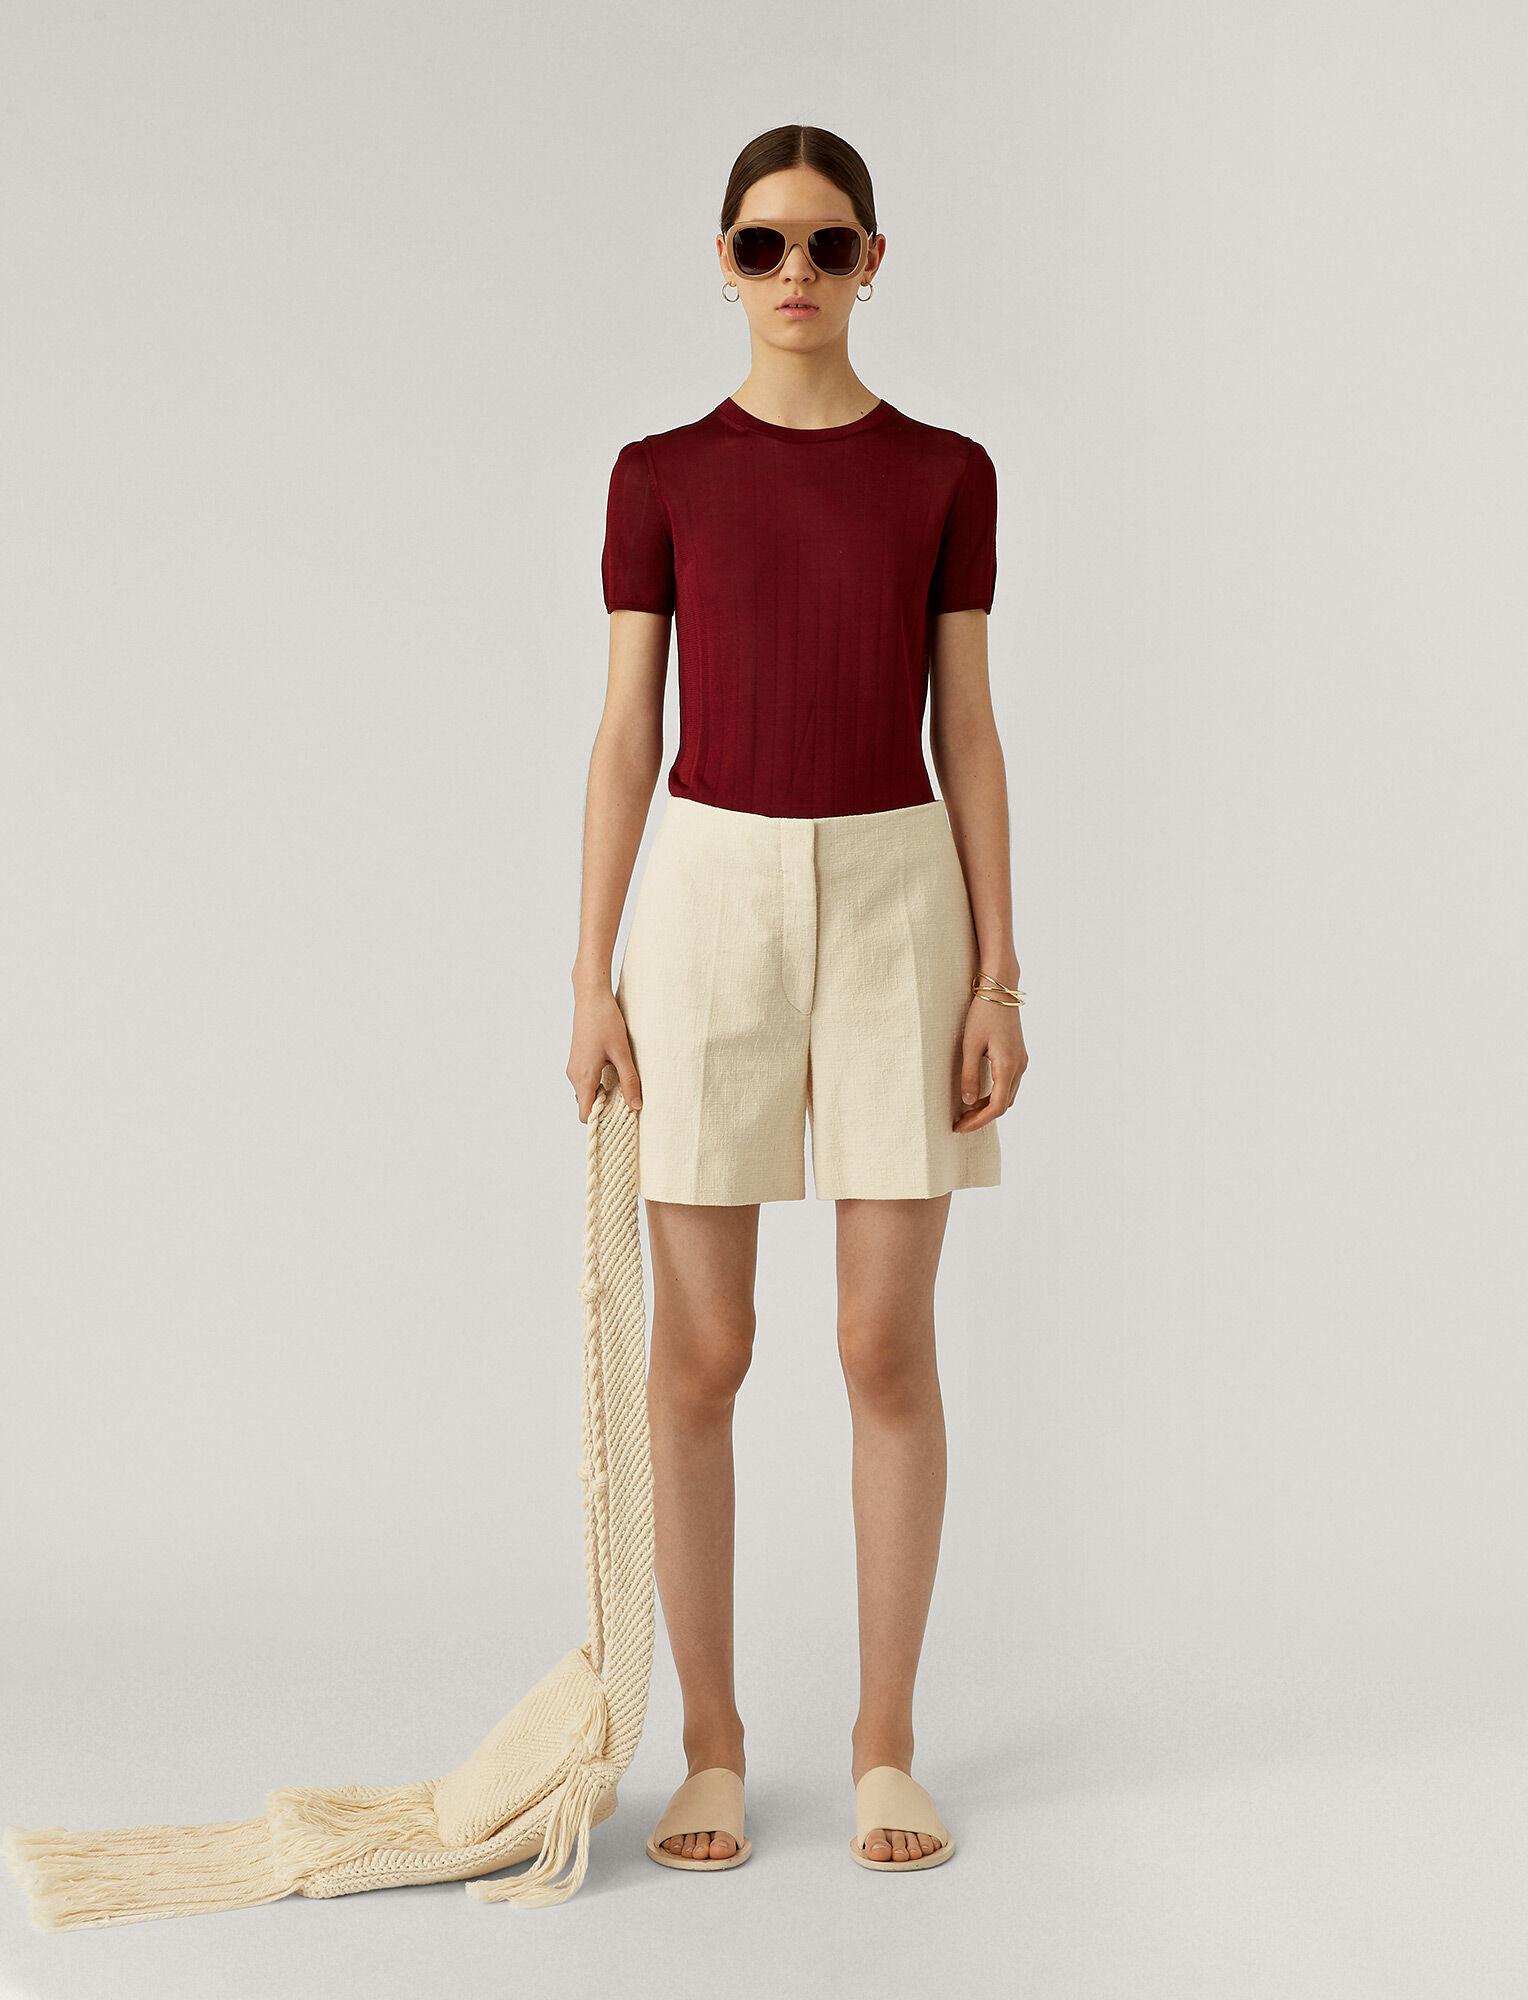 Joseph, Tallin Rustic Canvas Trousers, in CREAM